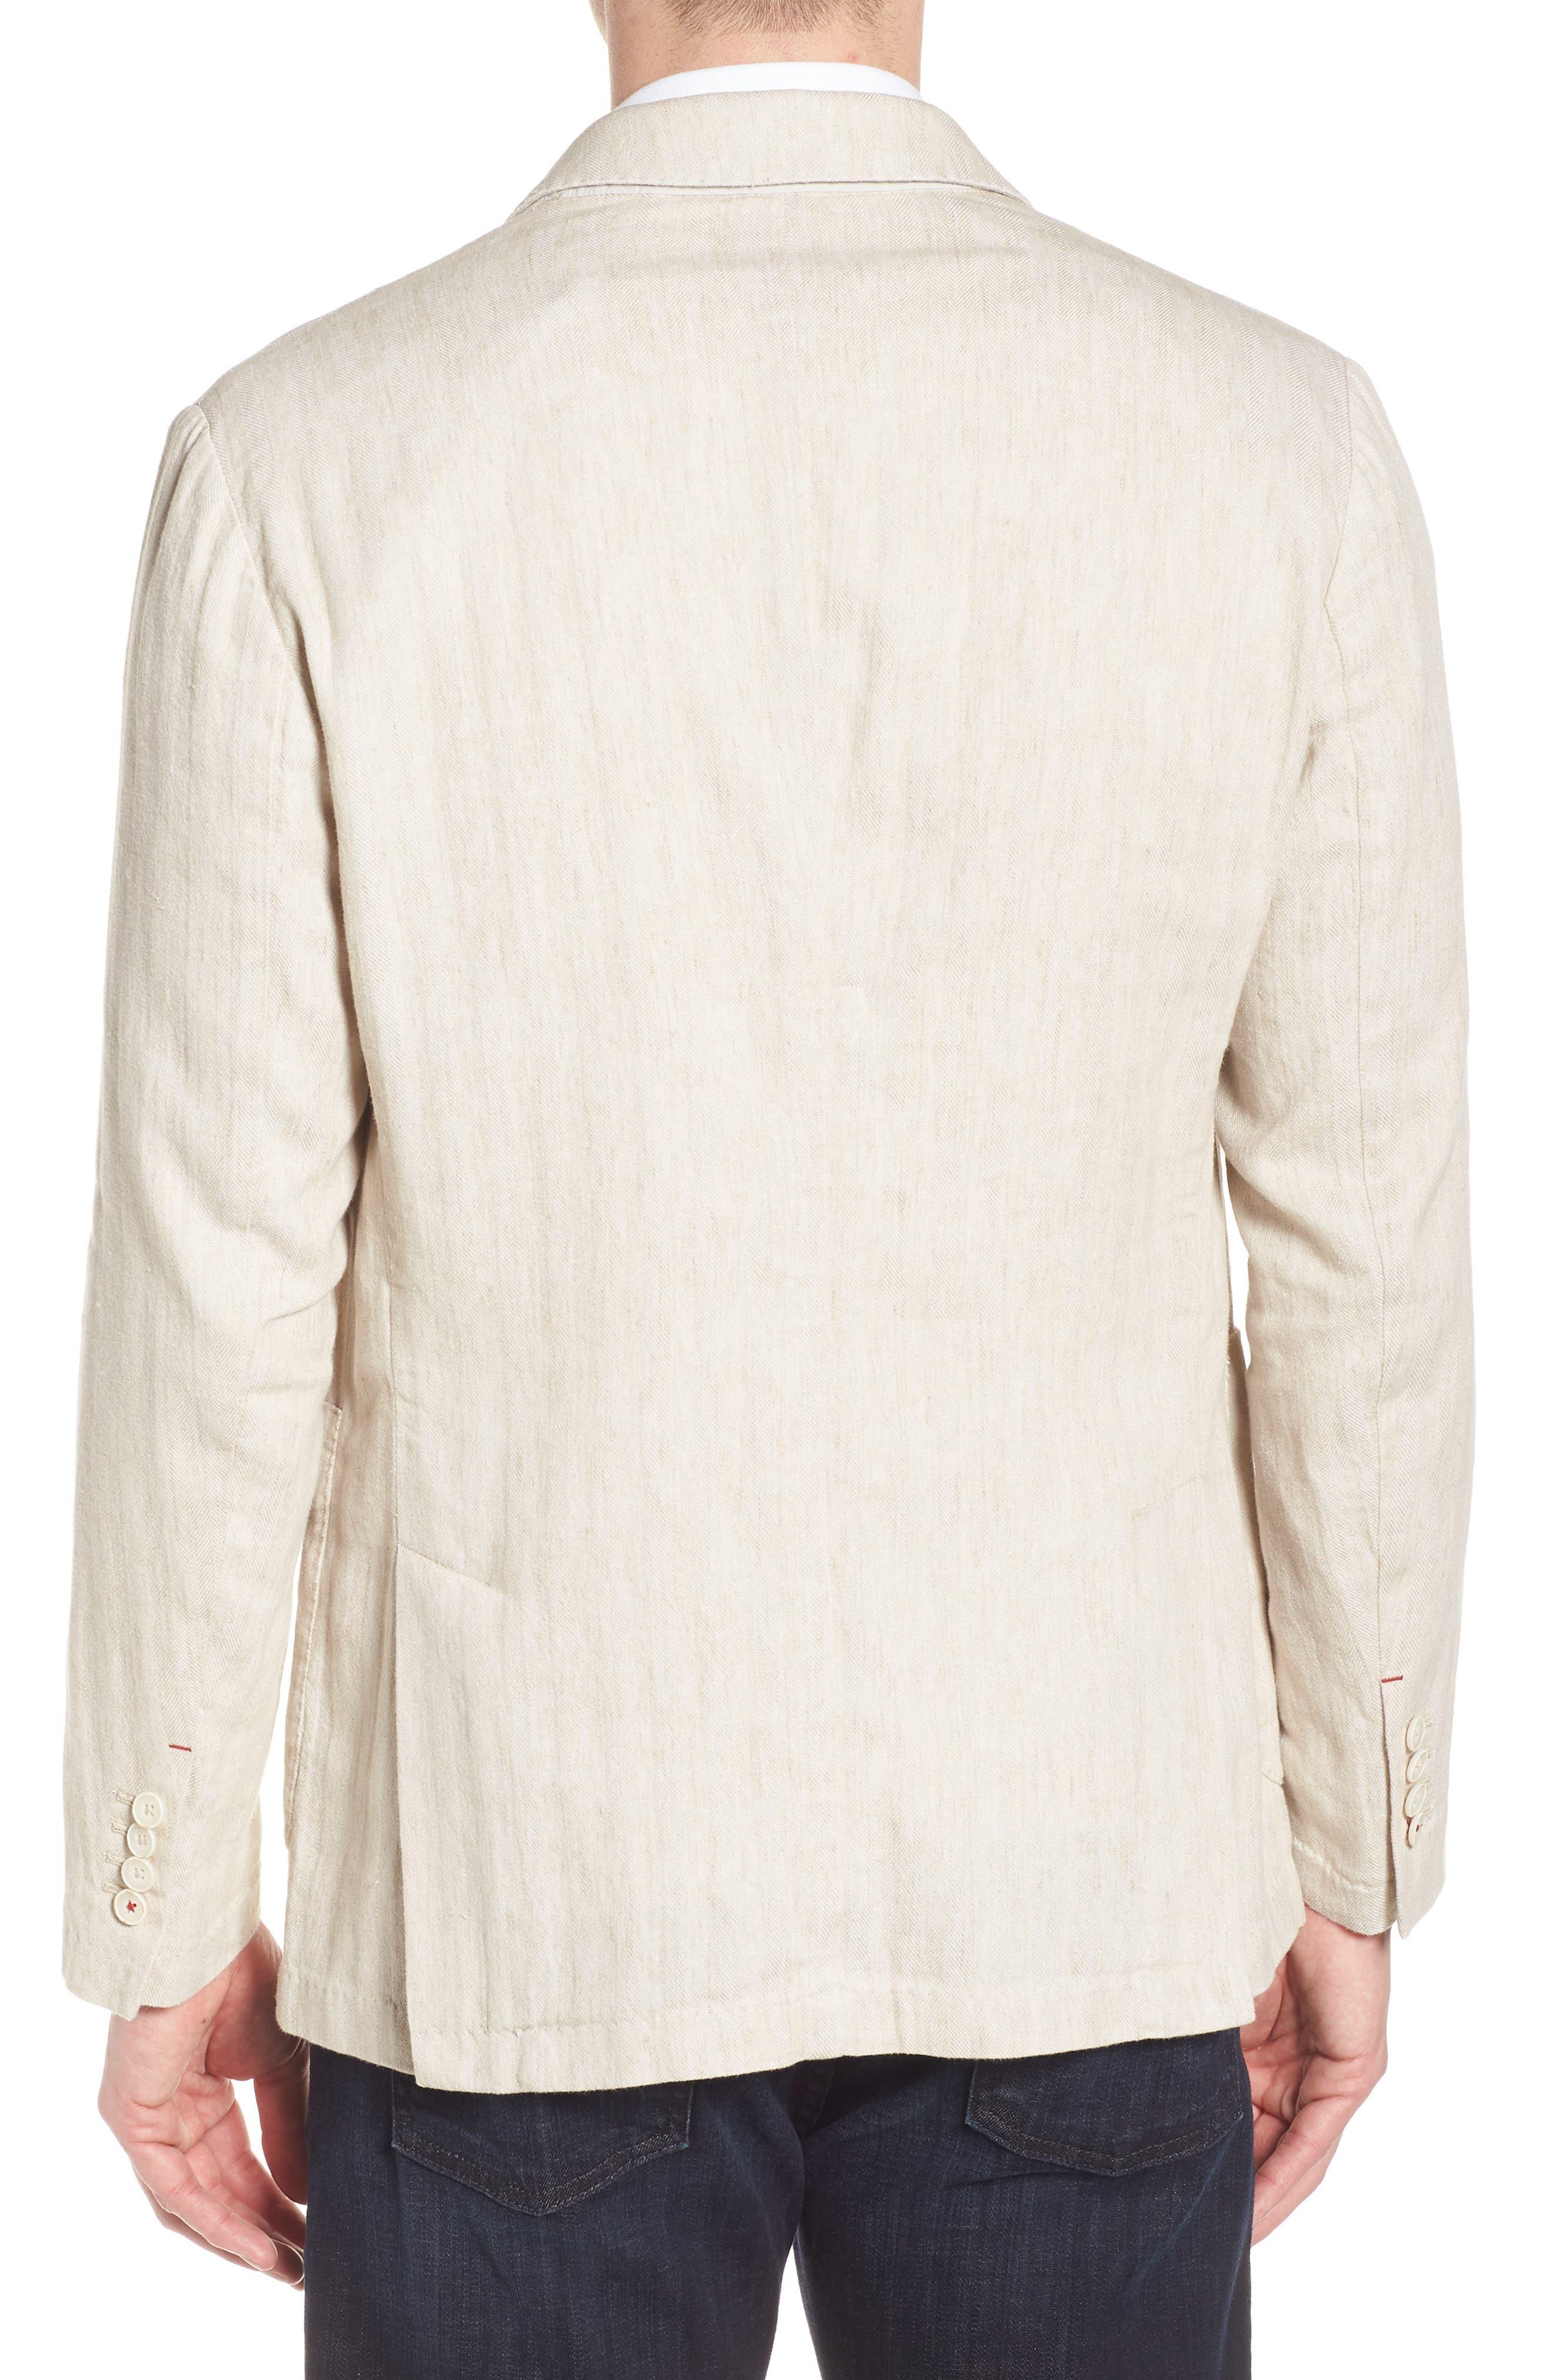 Regular Fit Herringbone Cotton & Linen Blazer,                             Alternate thumbnail 2, color,                             200